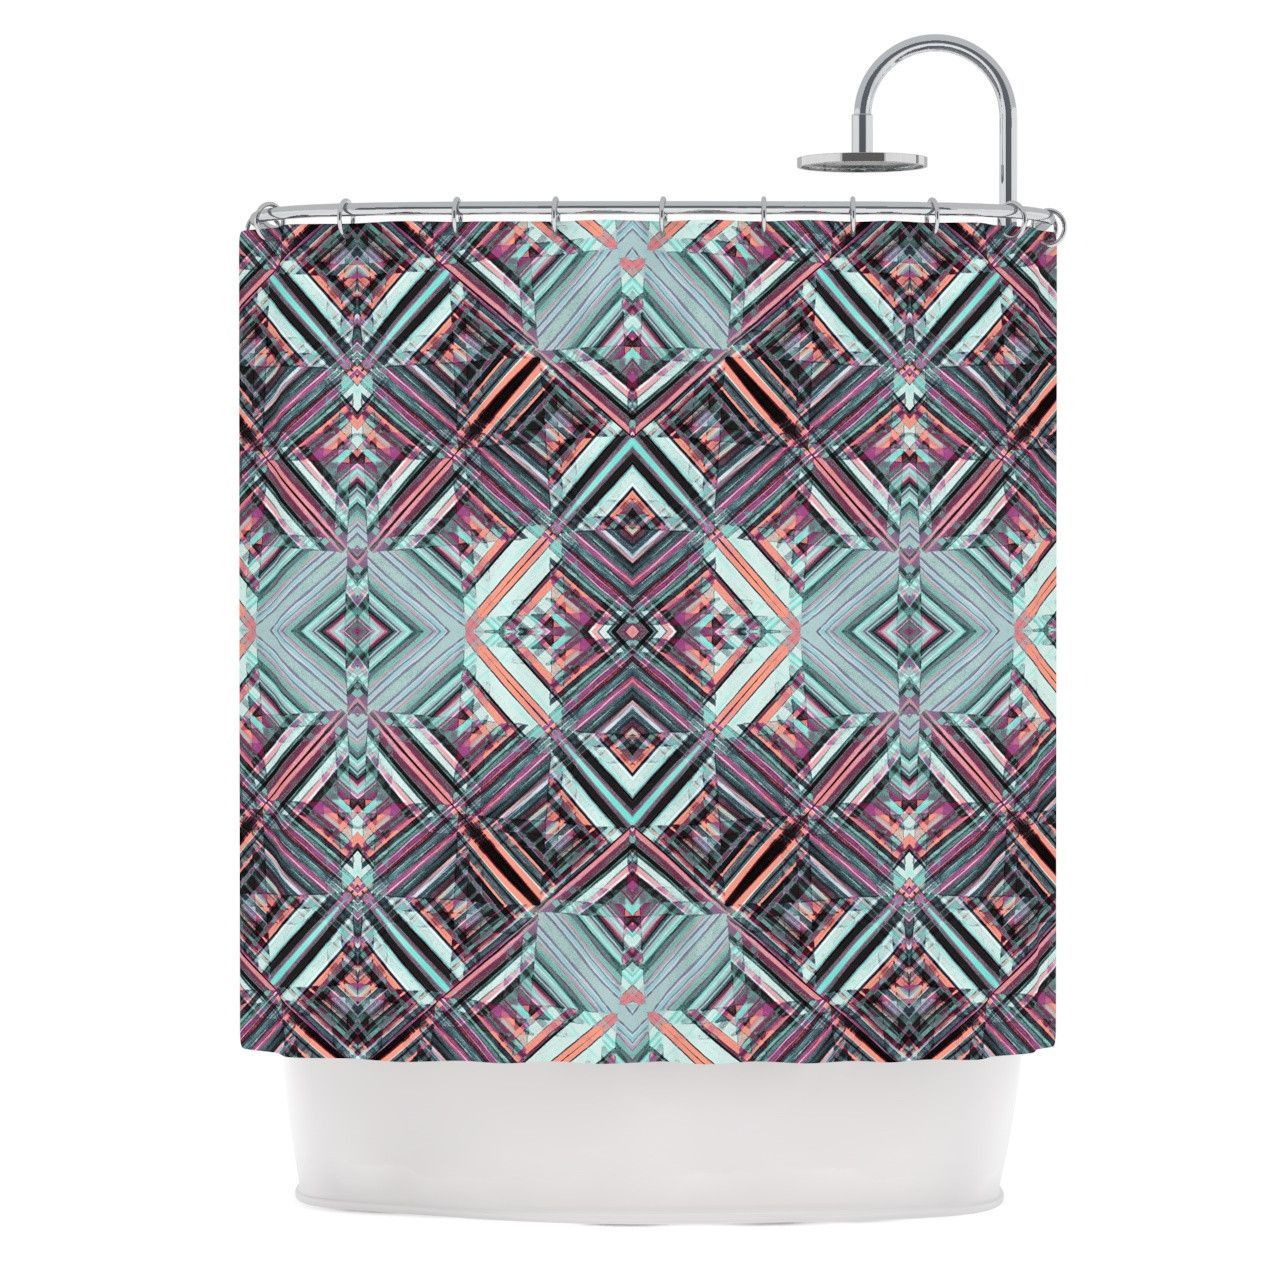 Salle De Bain Shower Curtain ~ gabriela fuente watercolor caledoscope purple teal shower curtain